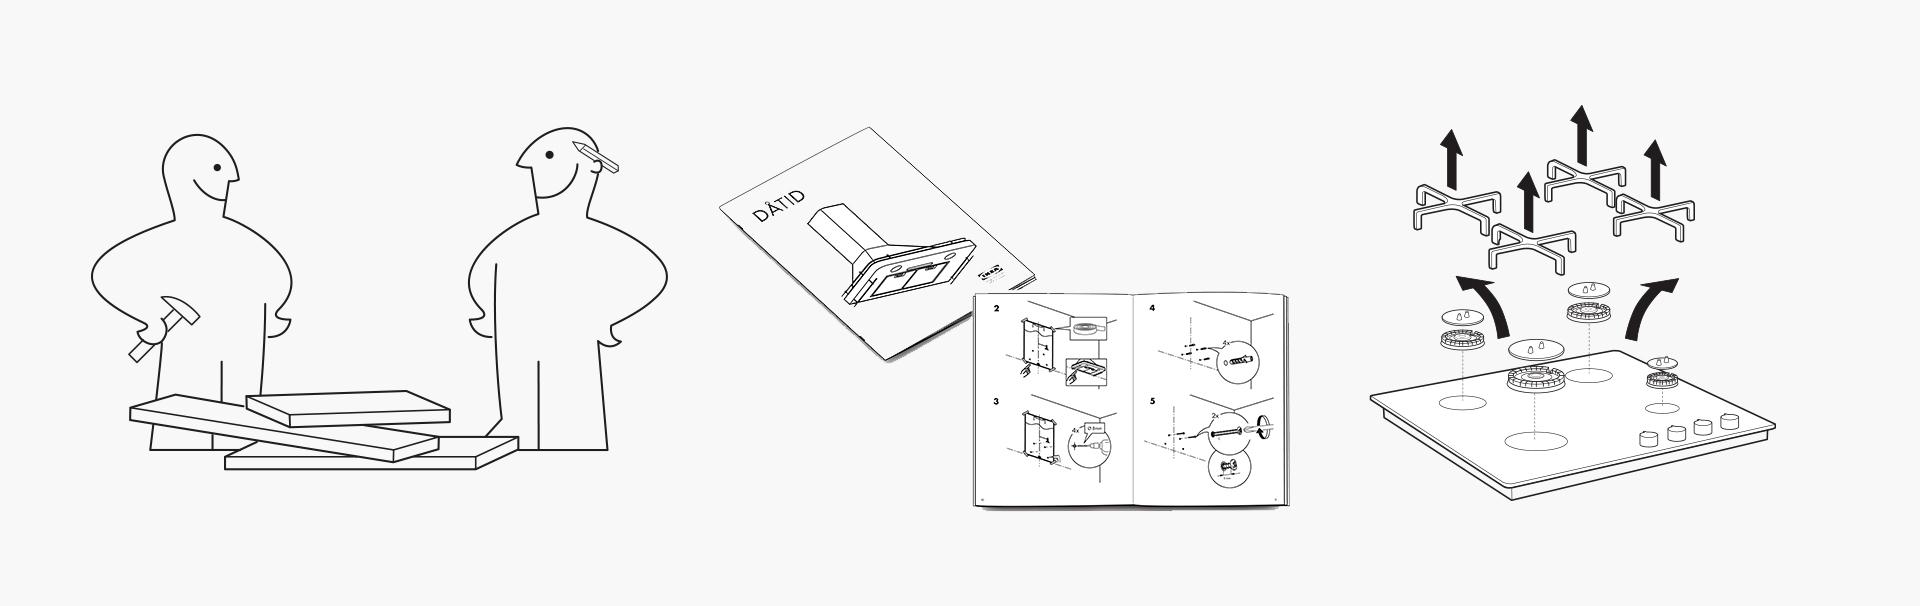 manuali tecnici grafica frison